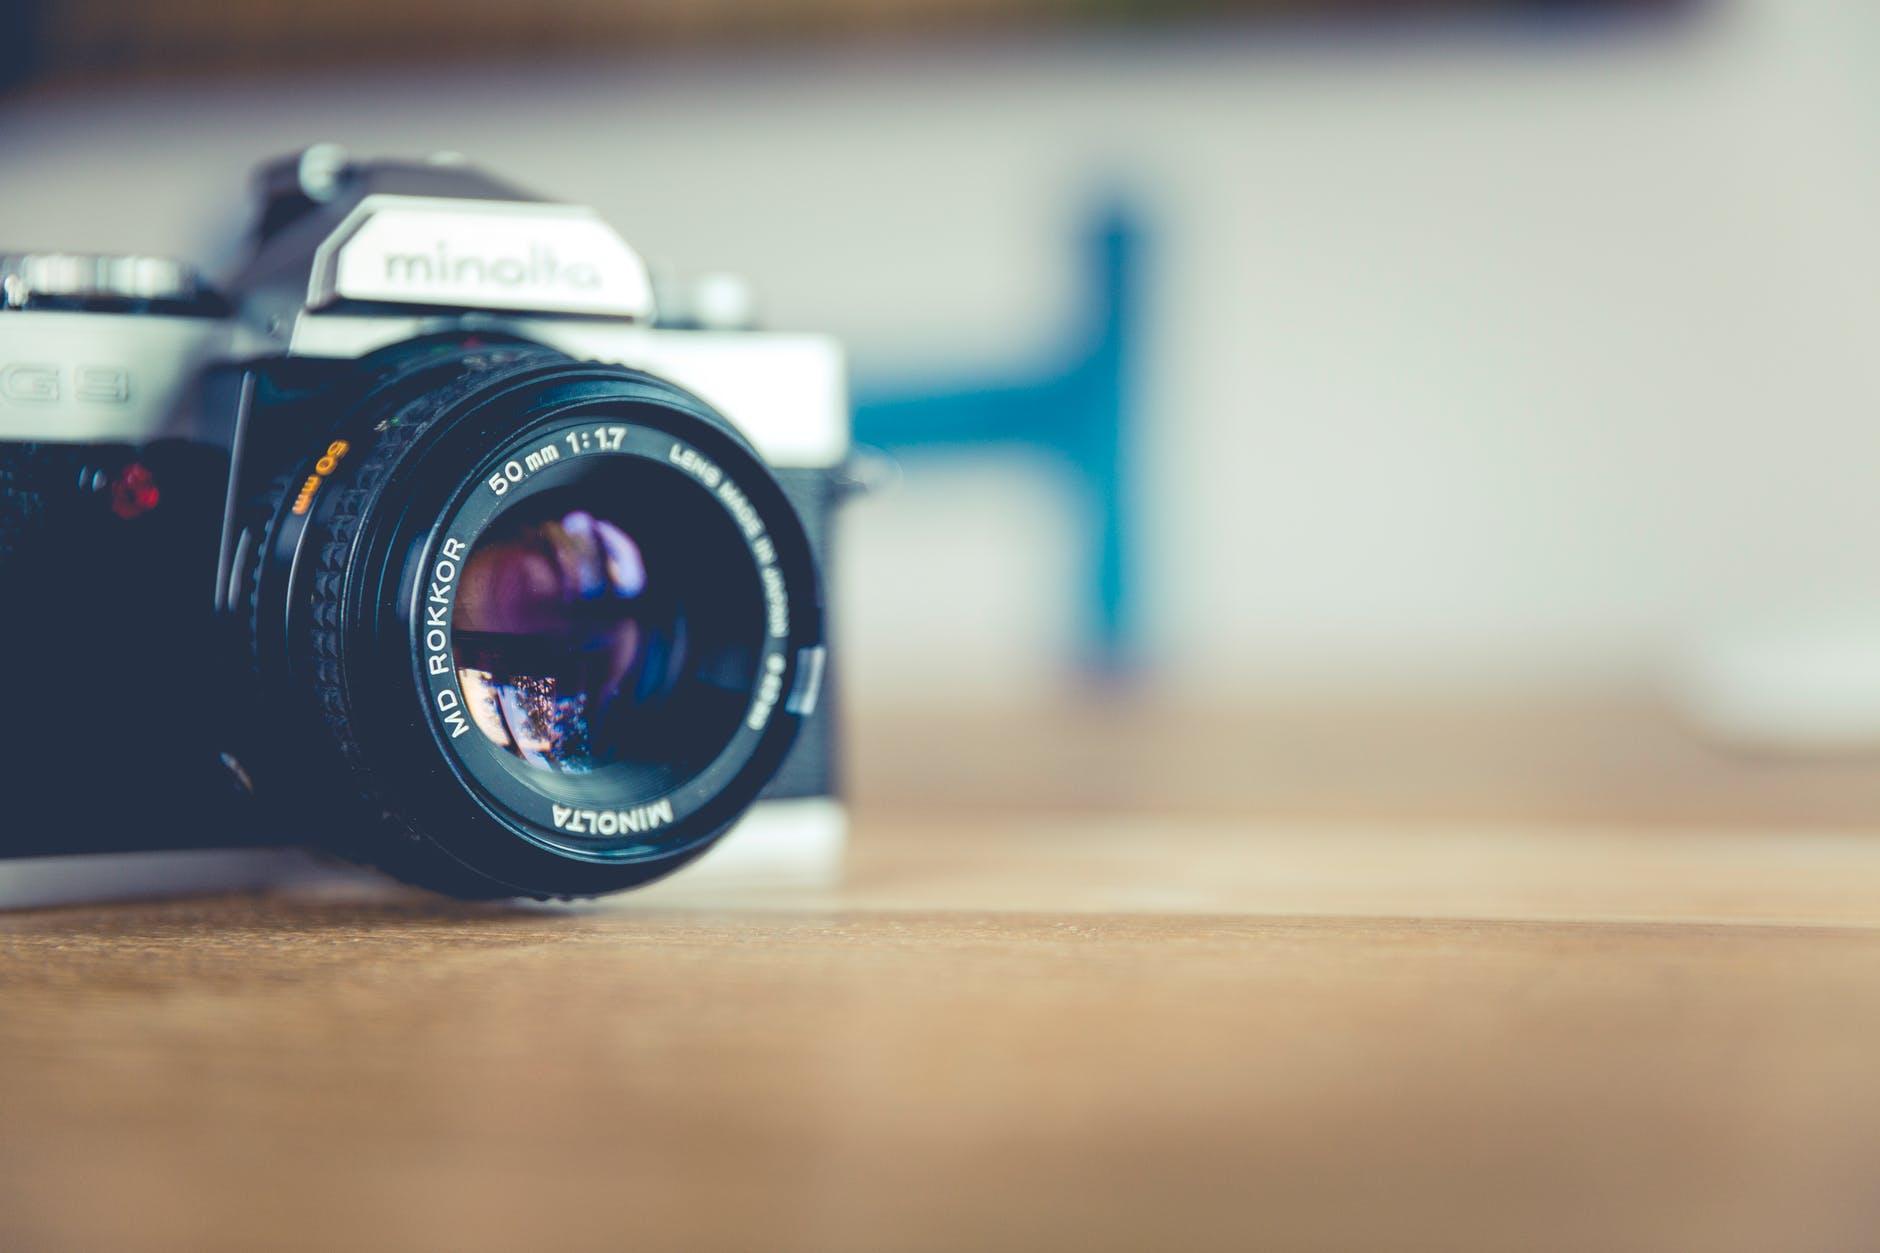 photographycertificate